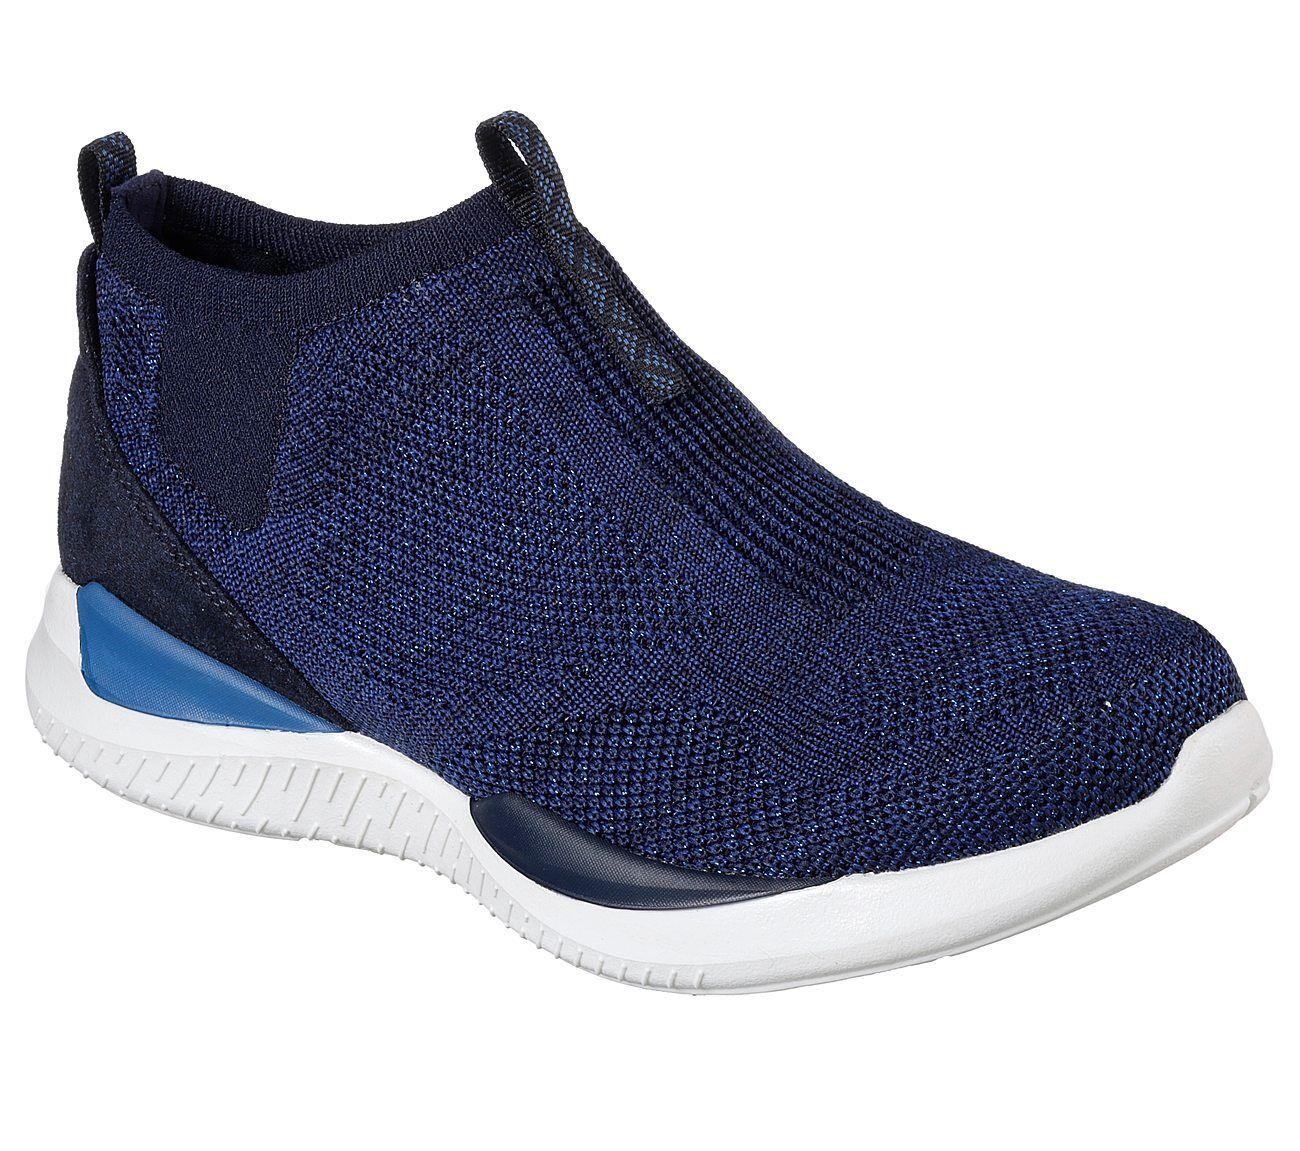 Skechers Matrixx - Modern Essential Trainers Memory Foam Knit Damenschuhe Schuhes 12459